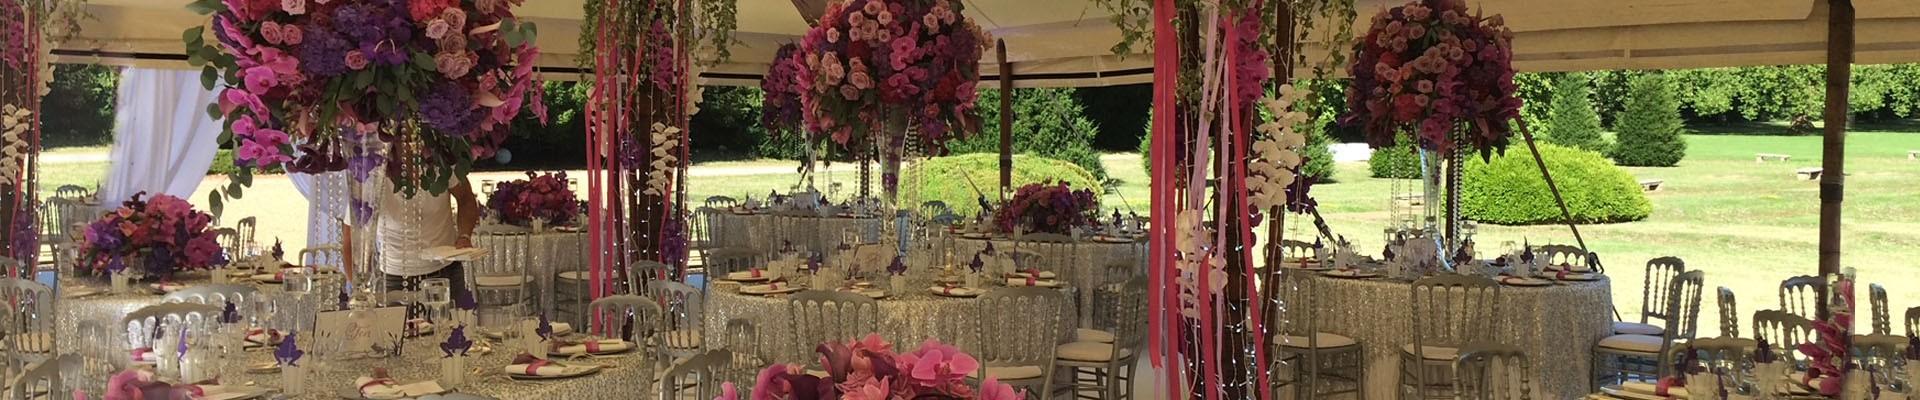 Vi arrangerar kändisbröllop